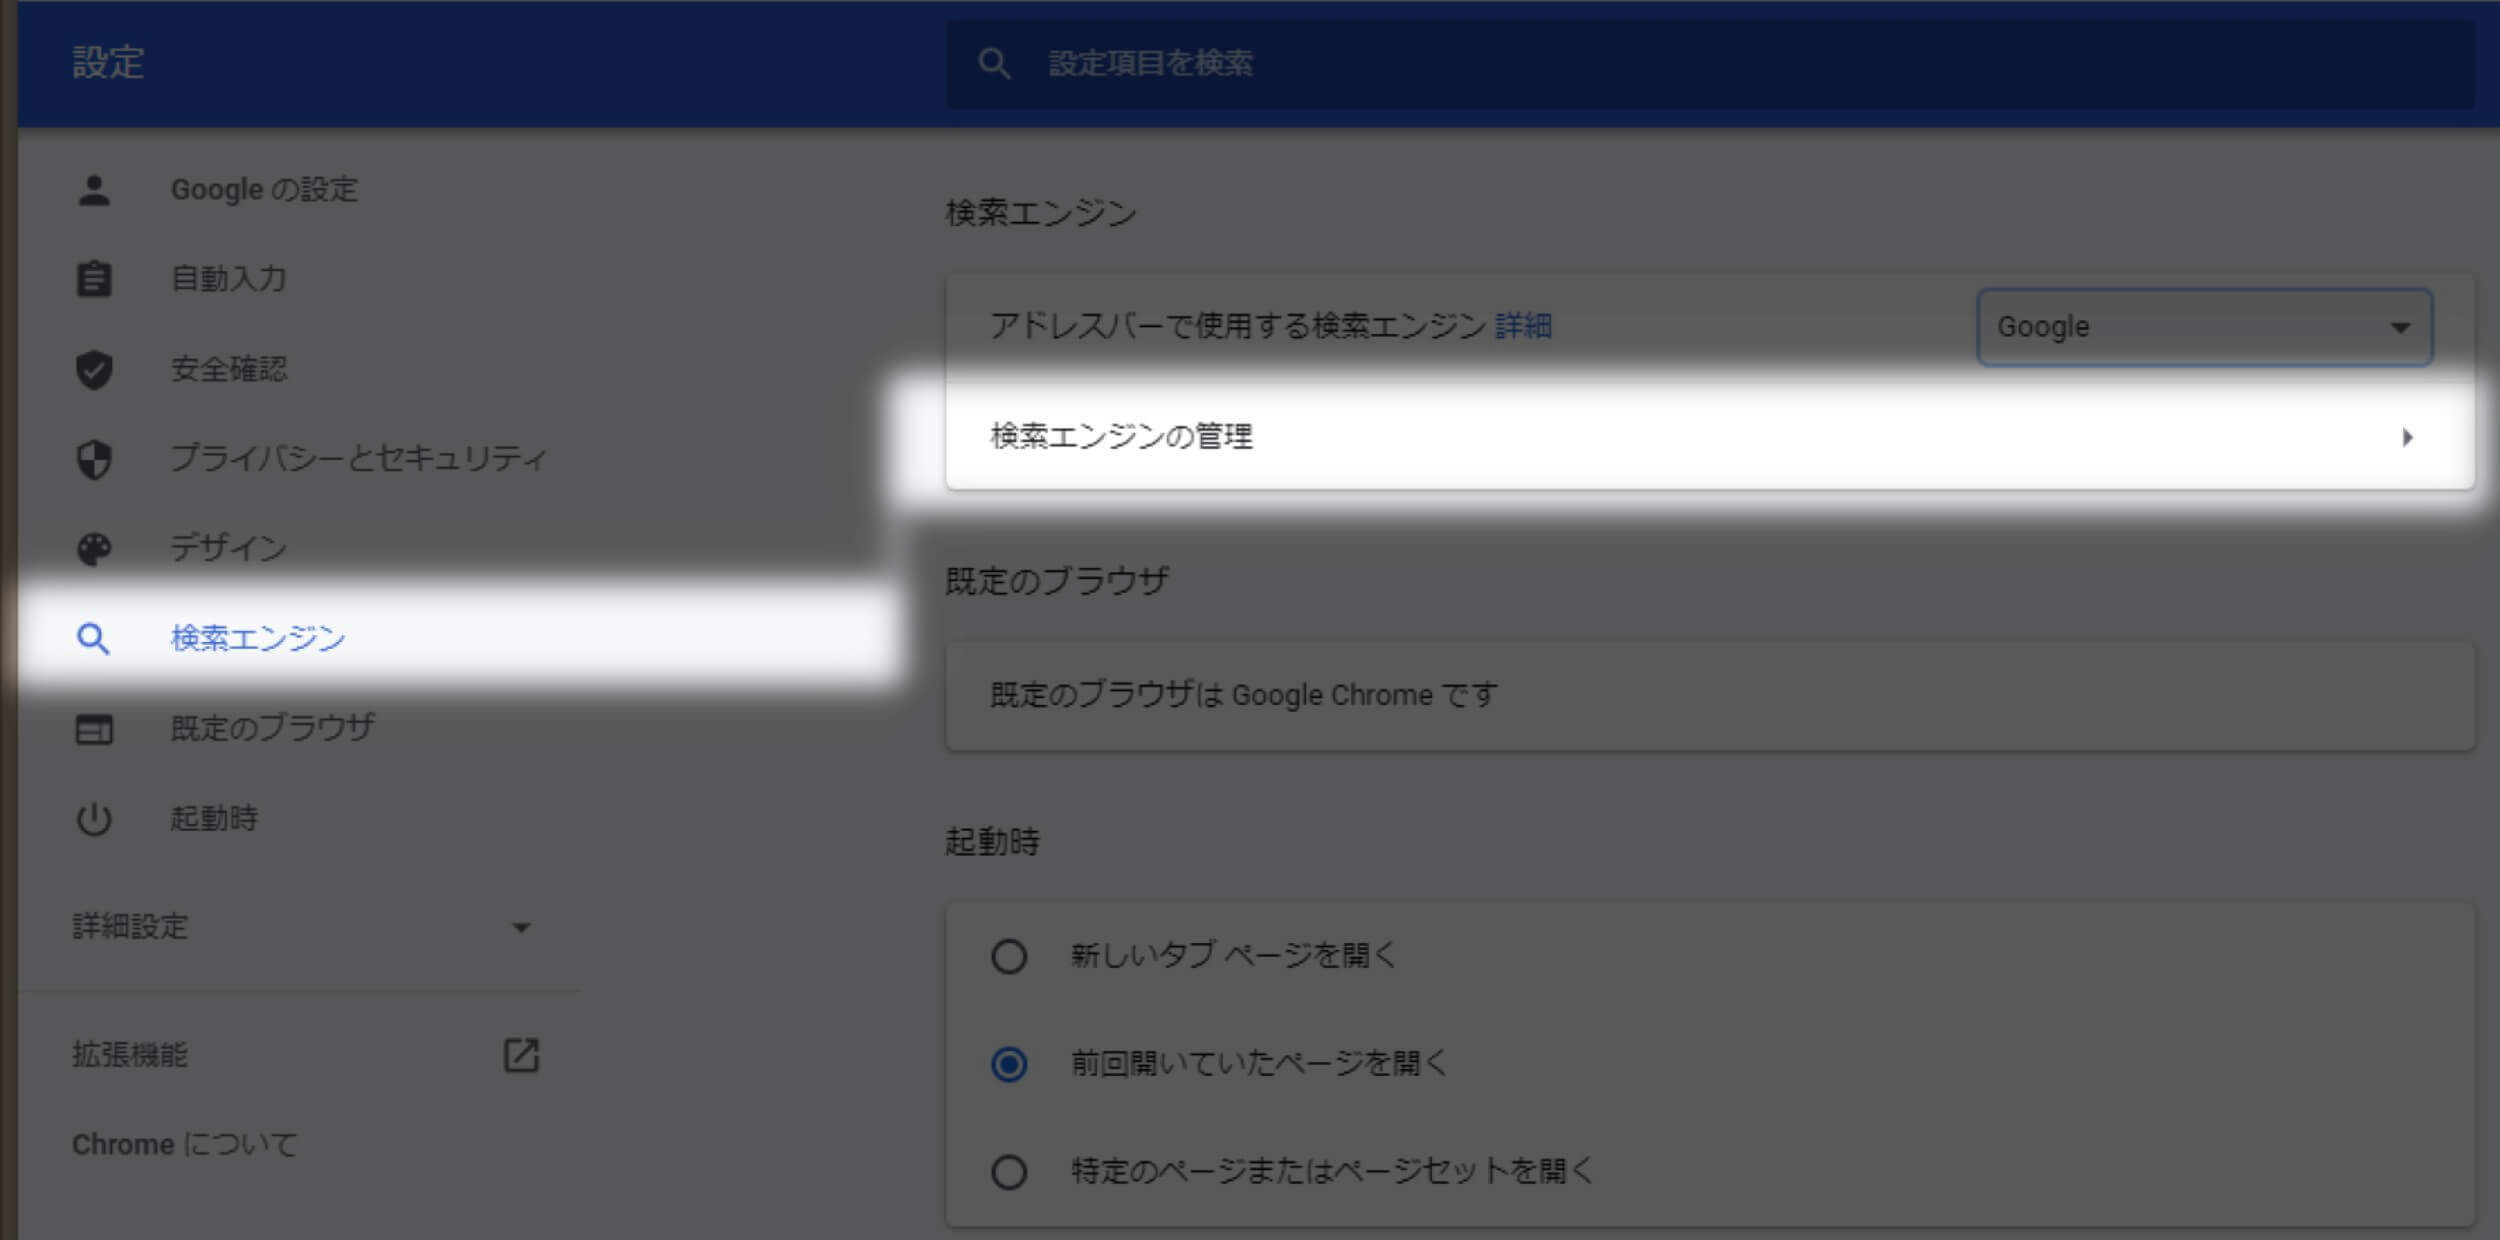 GoogleChrome設定→検索エンジン